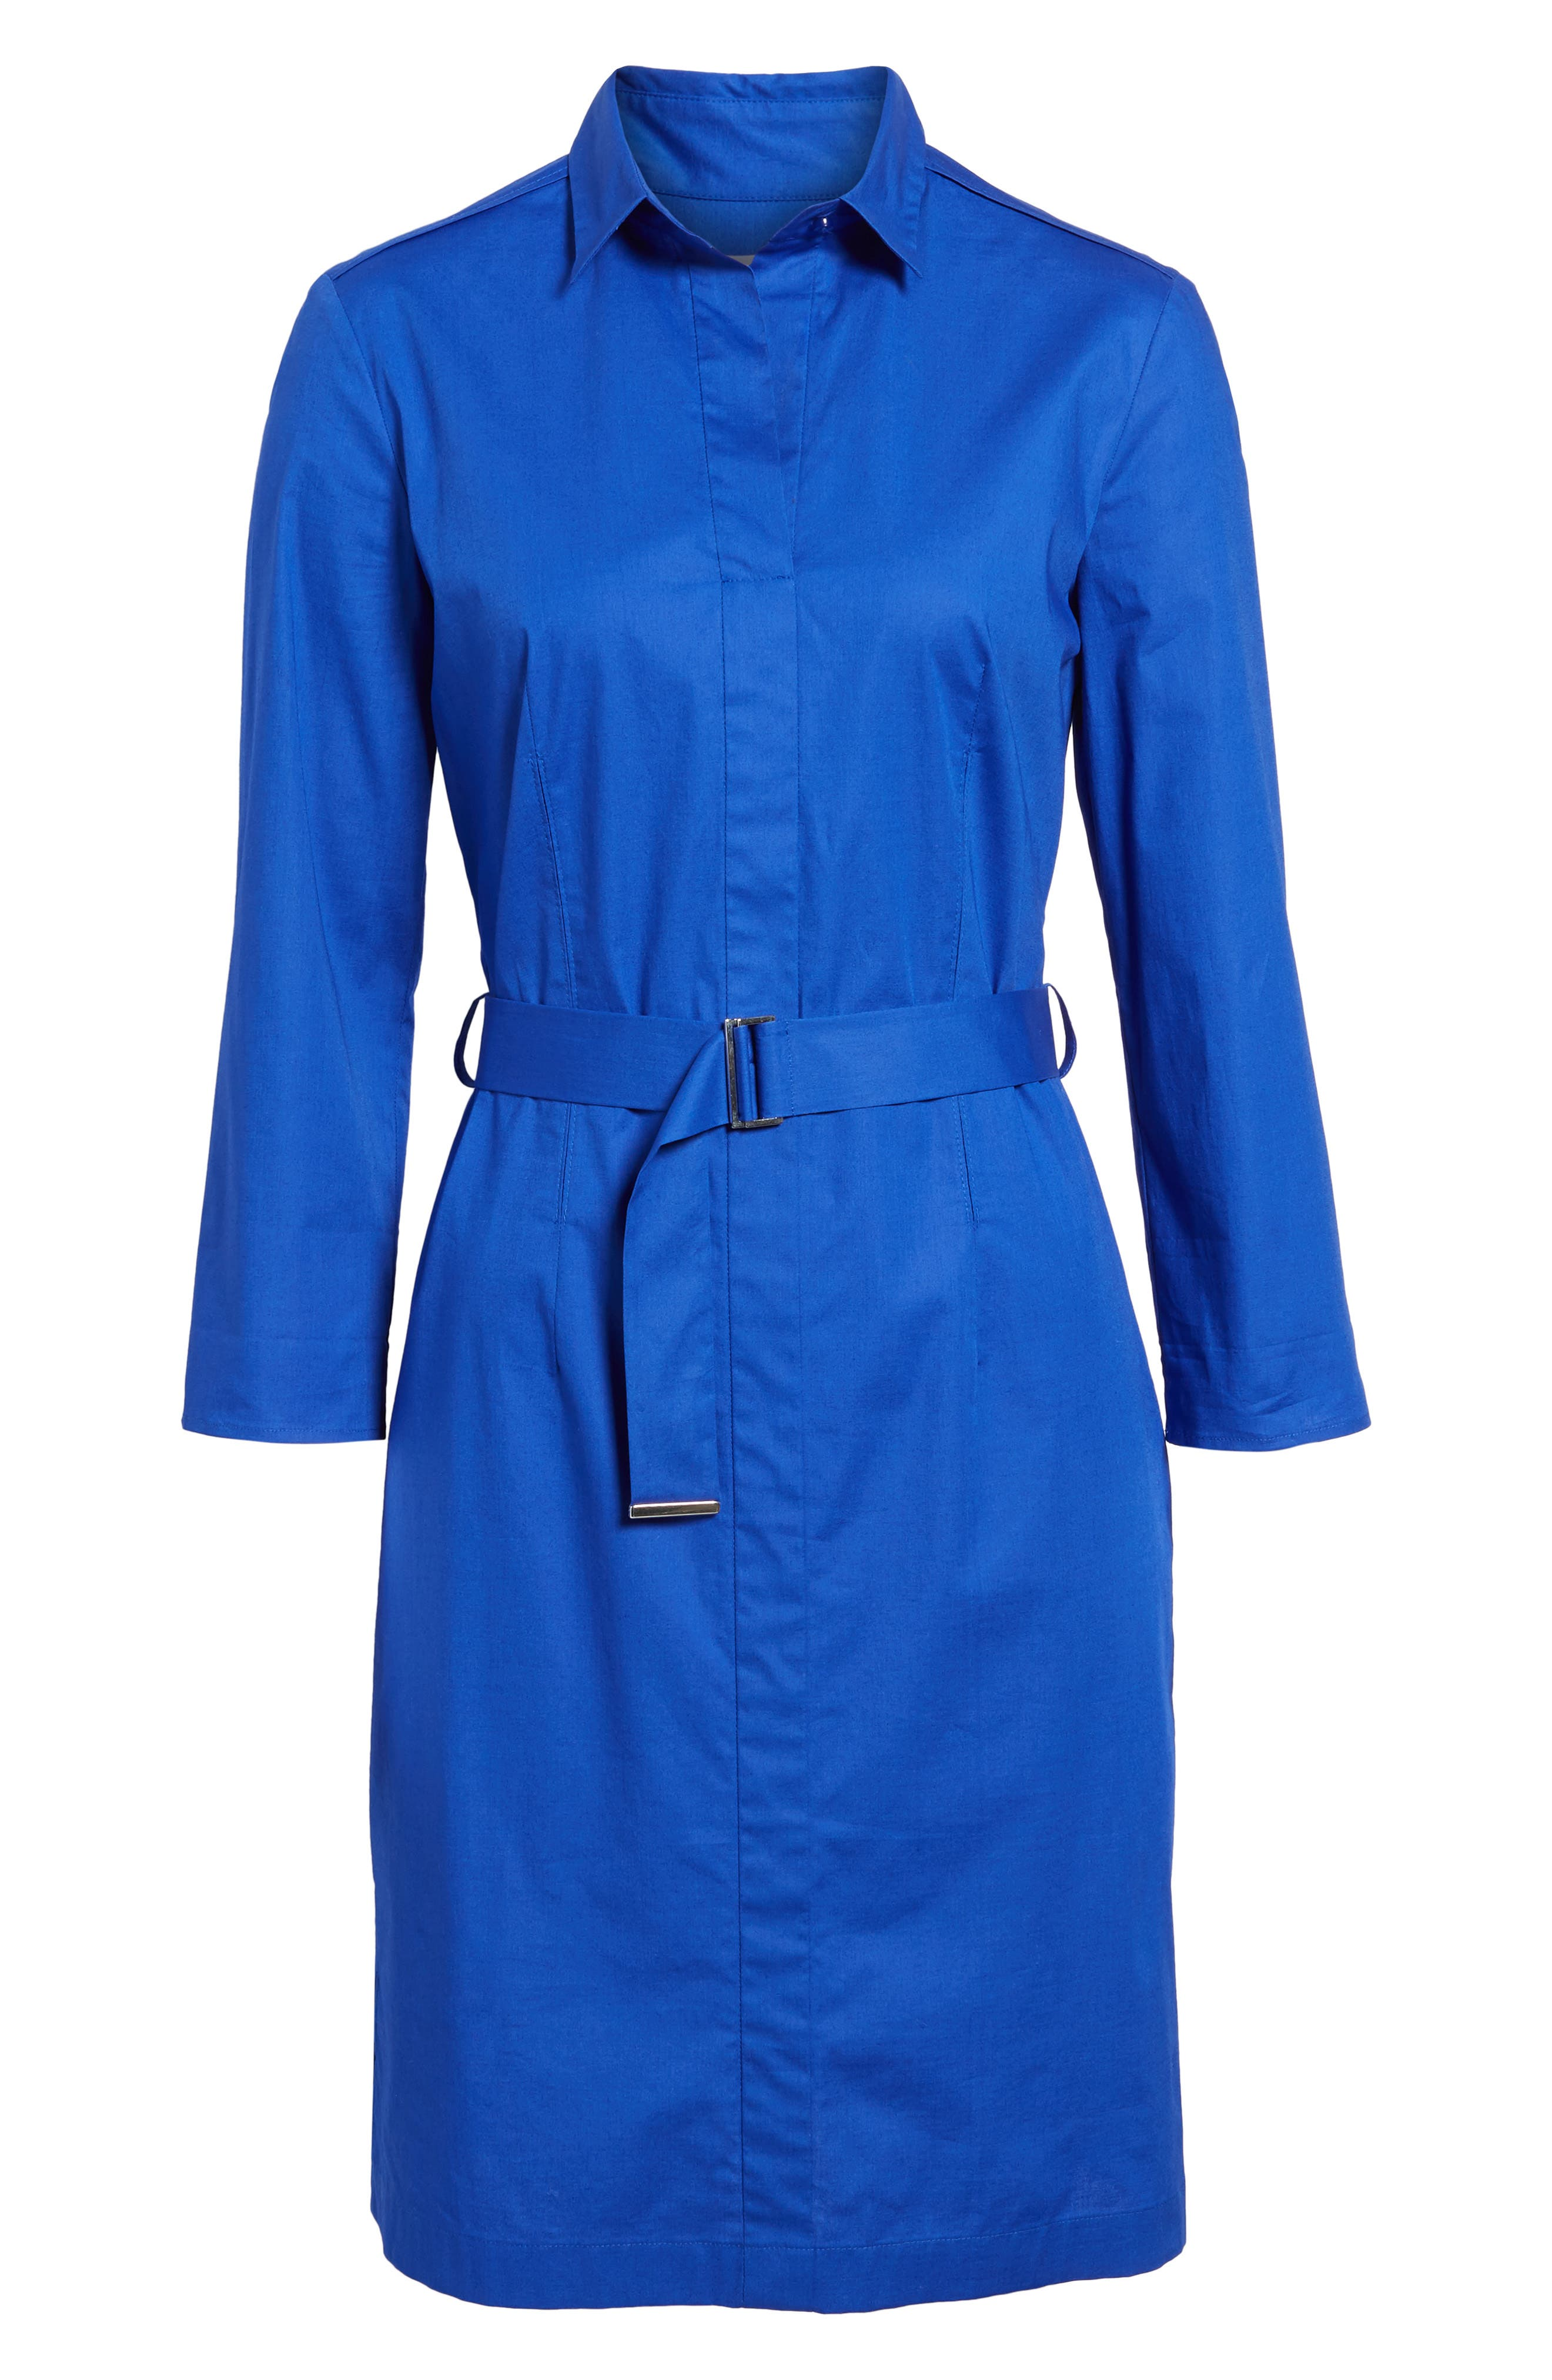 Dashir Stretch Cotton Shirtdress,                             Alternate thumbnail 6, color,                             Sailor Blue